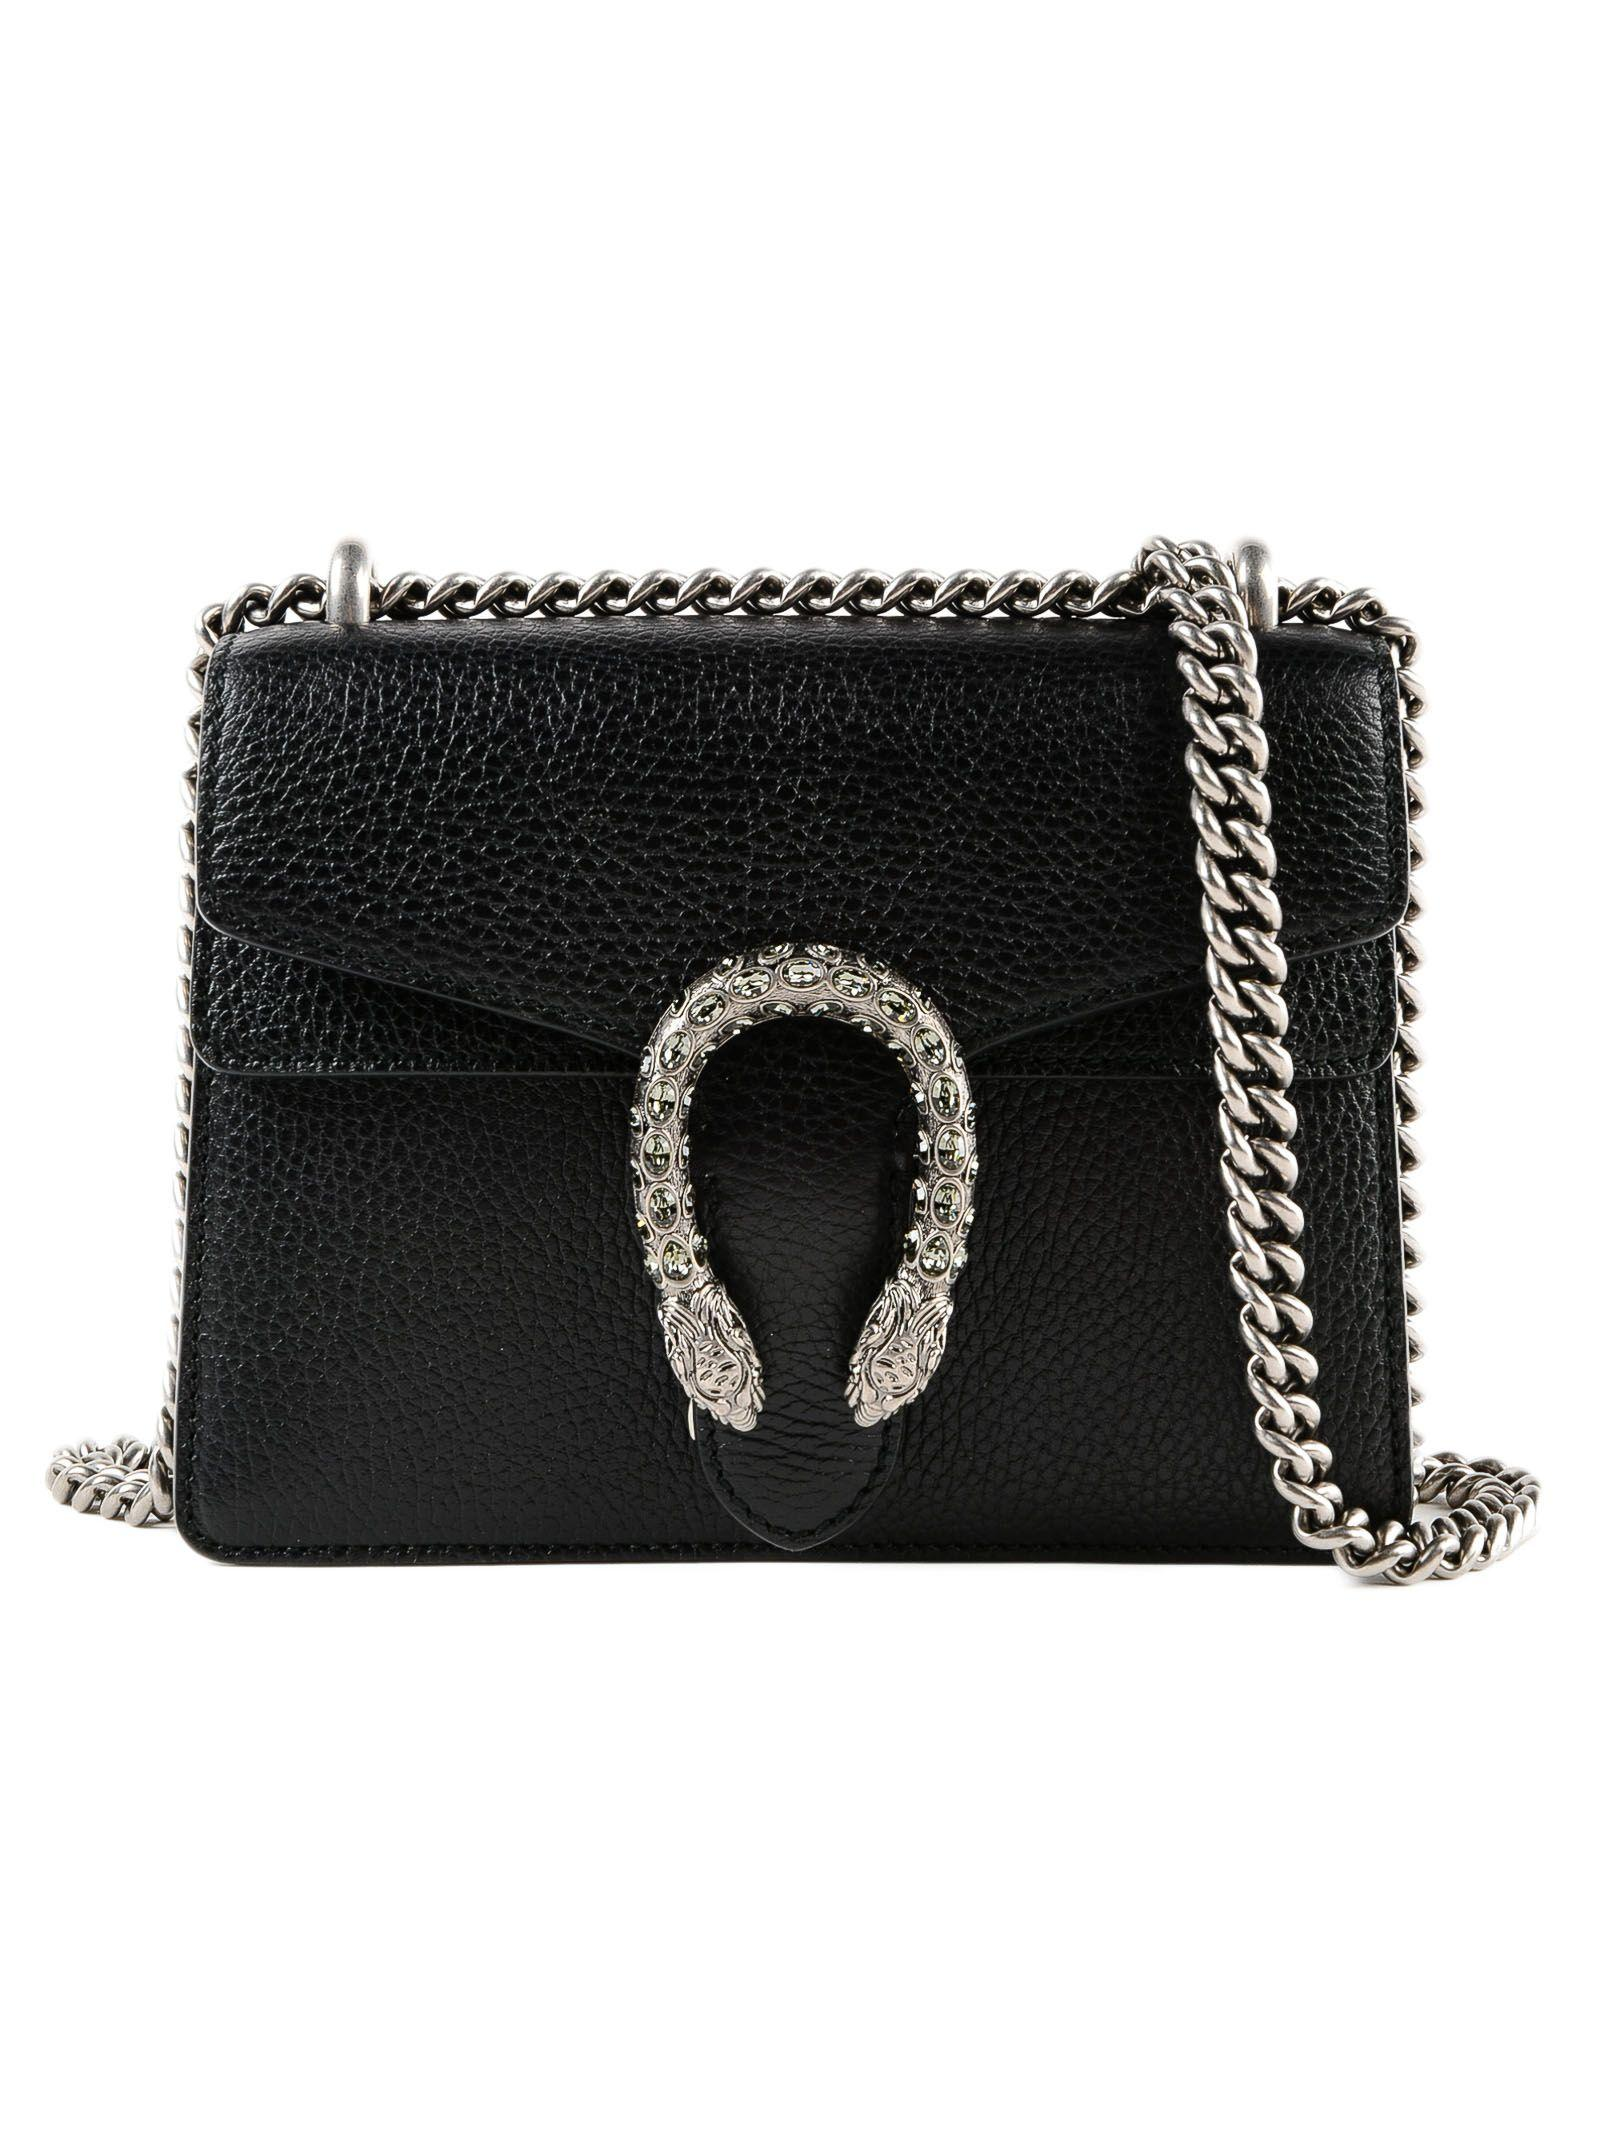 6dd8e73739d Gucci Dionysus Mini Textured-Leather Shoulder Bag In Black